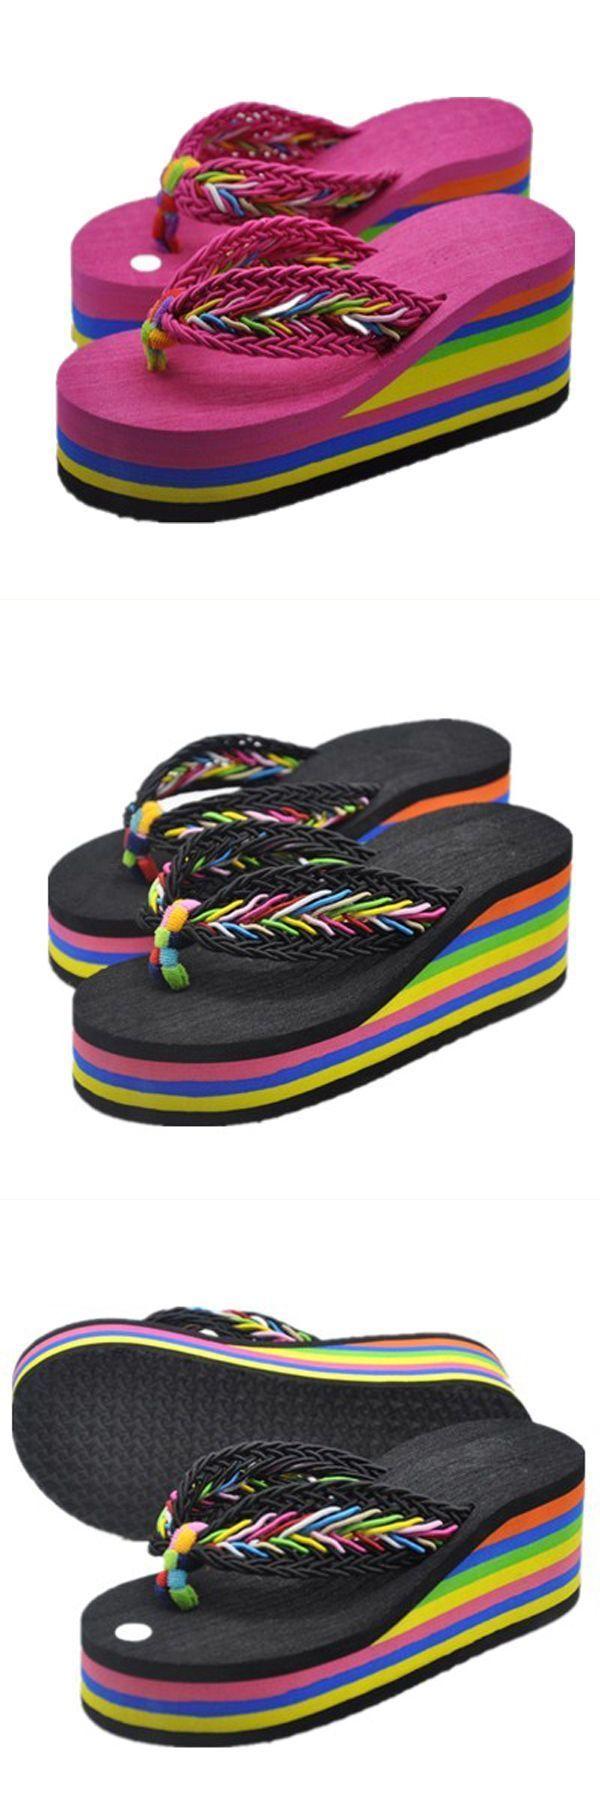 Women fashion wedge platform slippers hight heel rainbow flip flops beach sandals  sandals trips #cm #paris #sandals #no #6 #sandals #sandals #07 #sandals #us